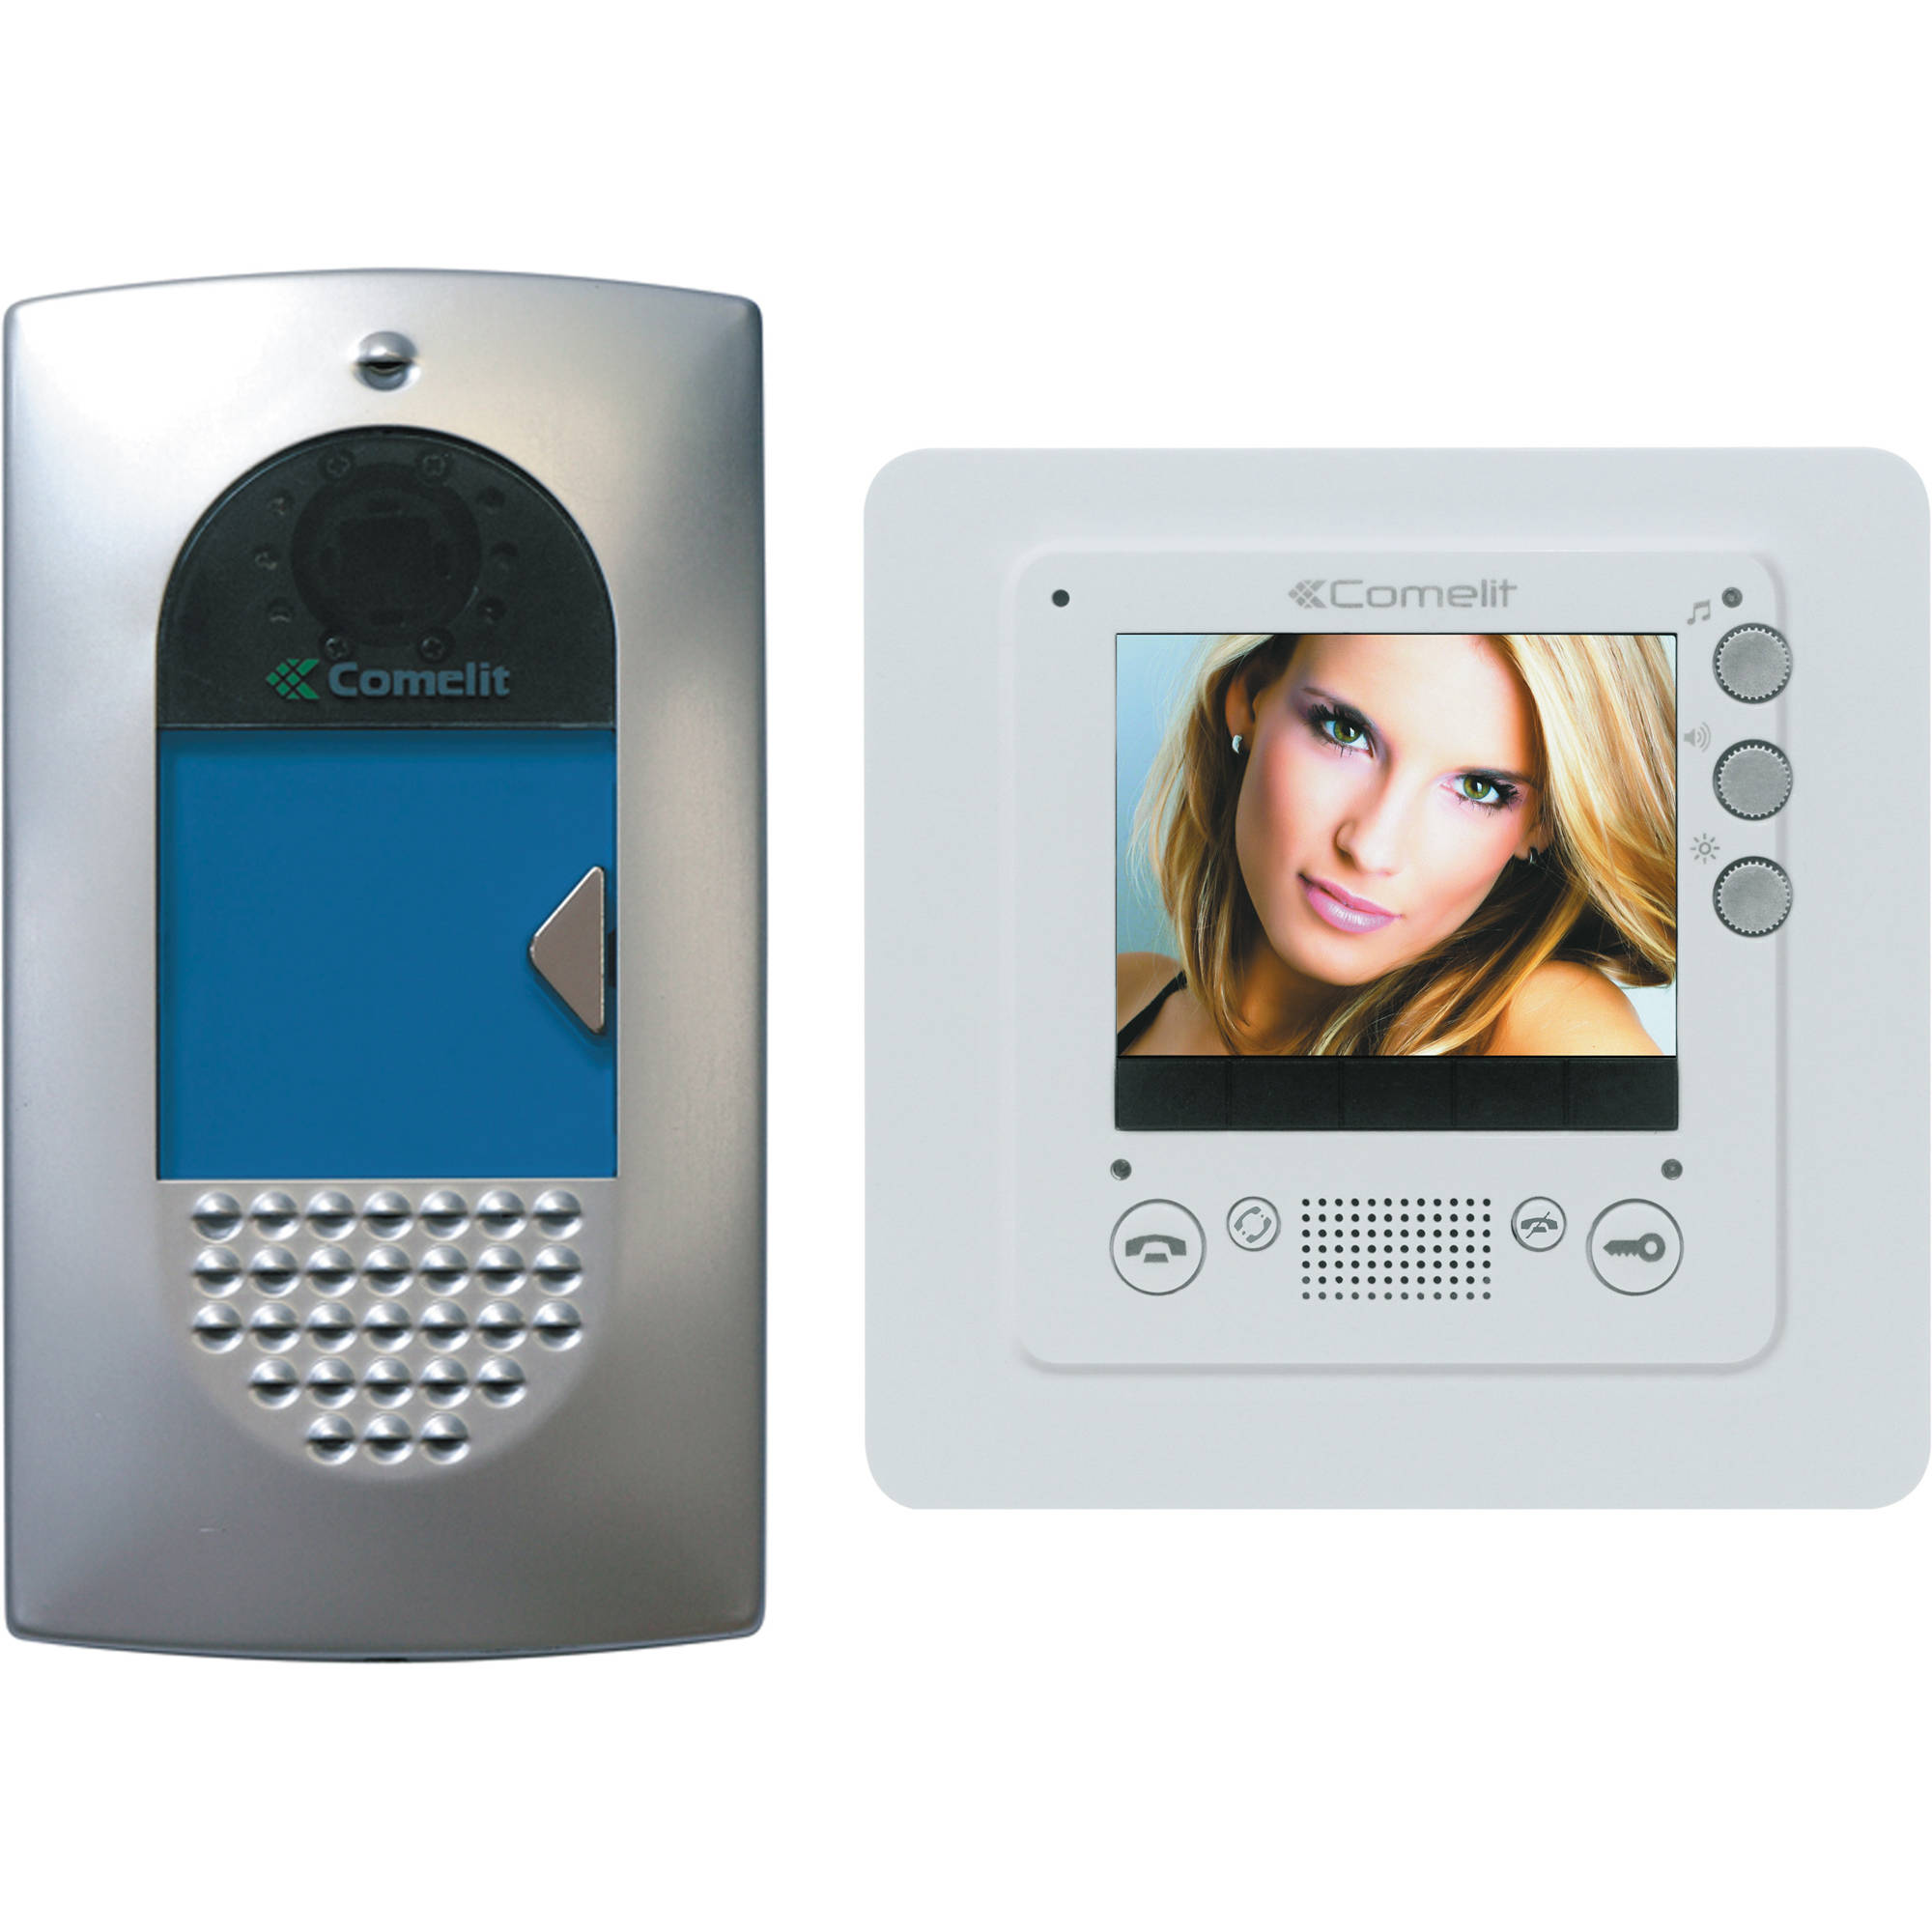 comelit hfx 720m hands free expandable video intercom hfx 720m. Black Bedroom Furniture Sets. Home Design Ideas